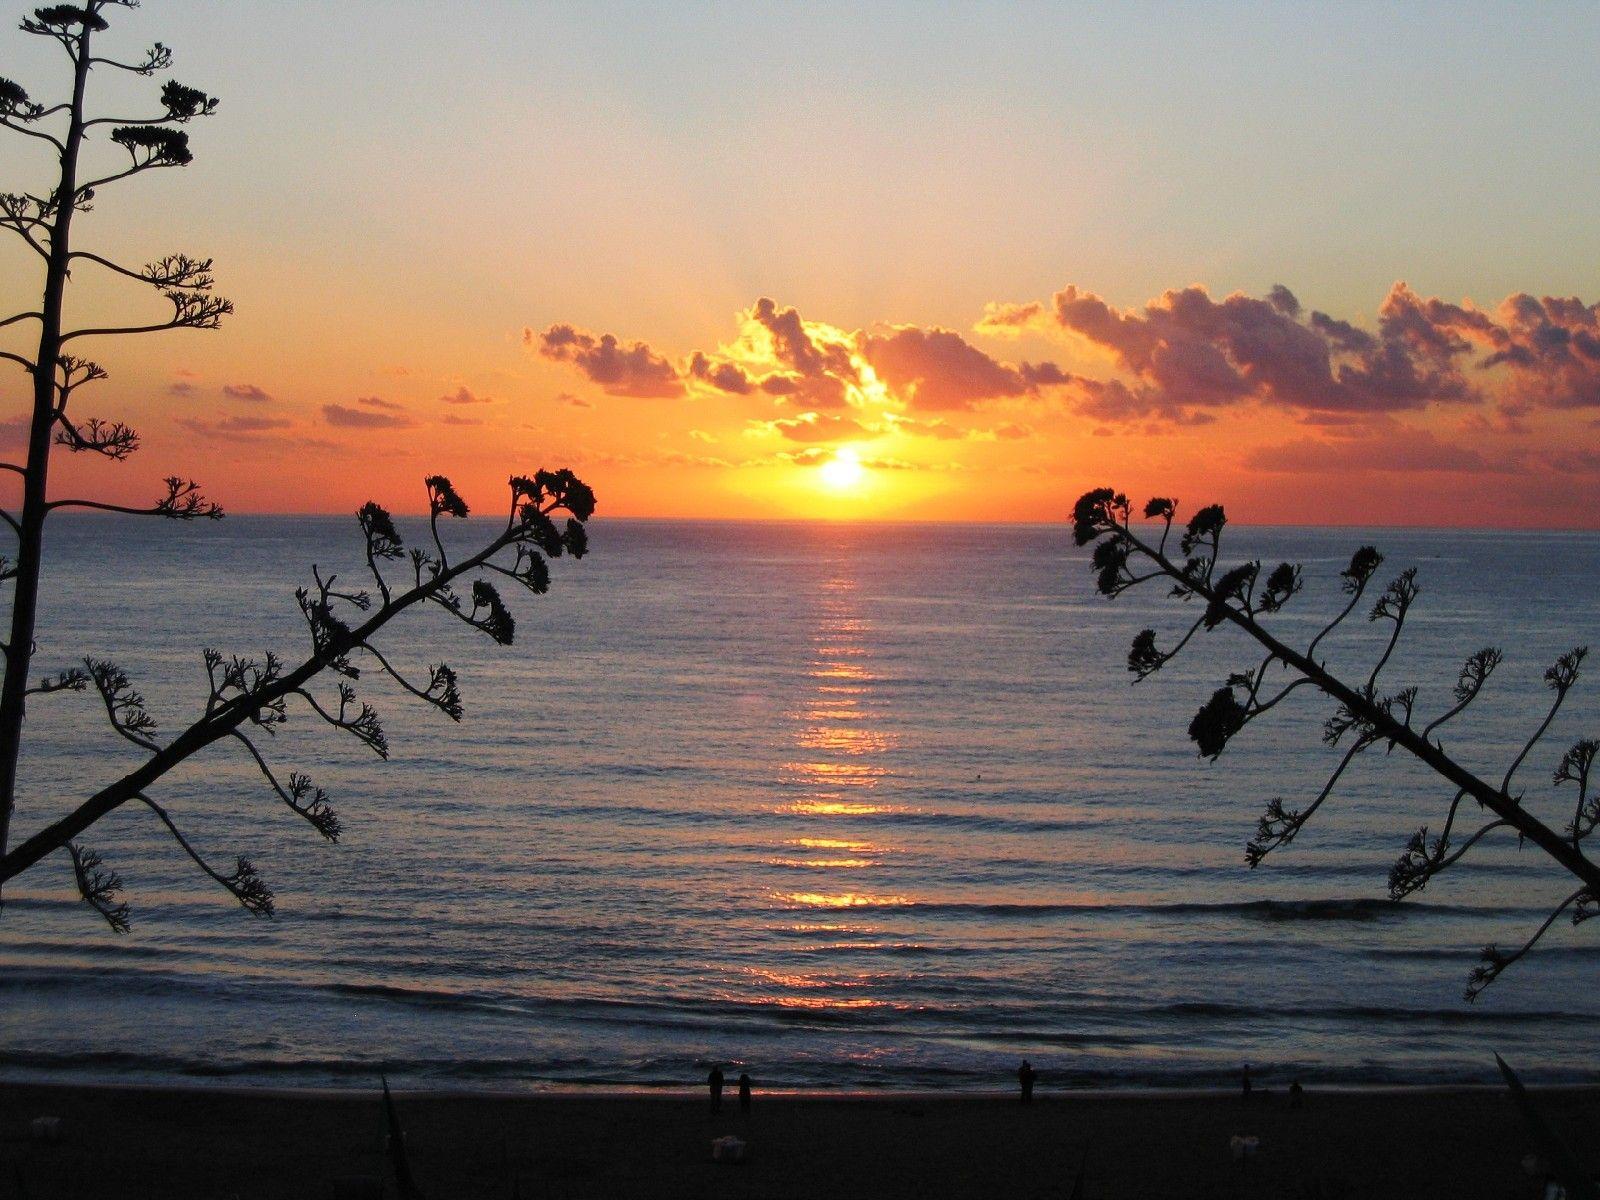 Sunset in bulgaria photo